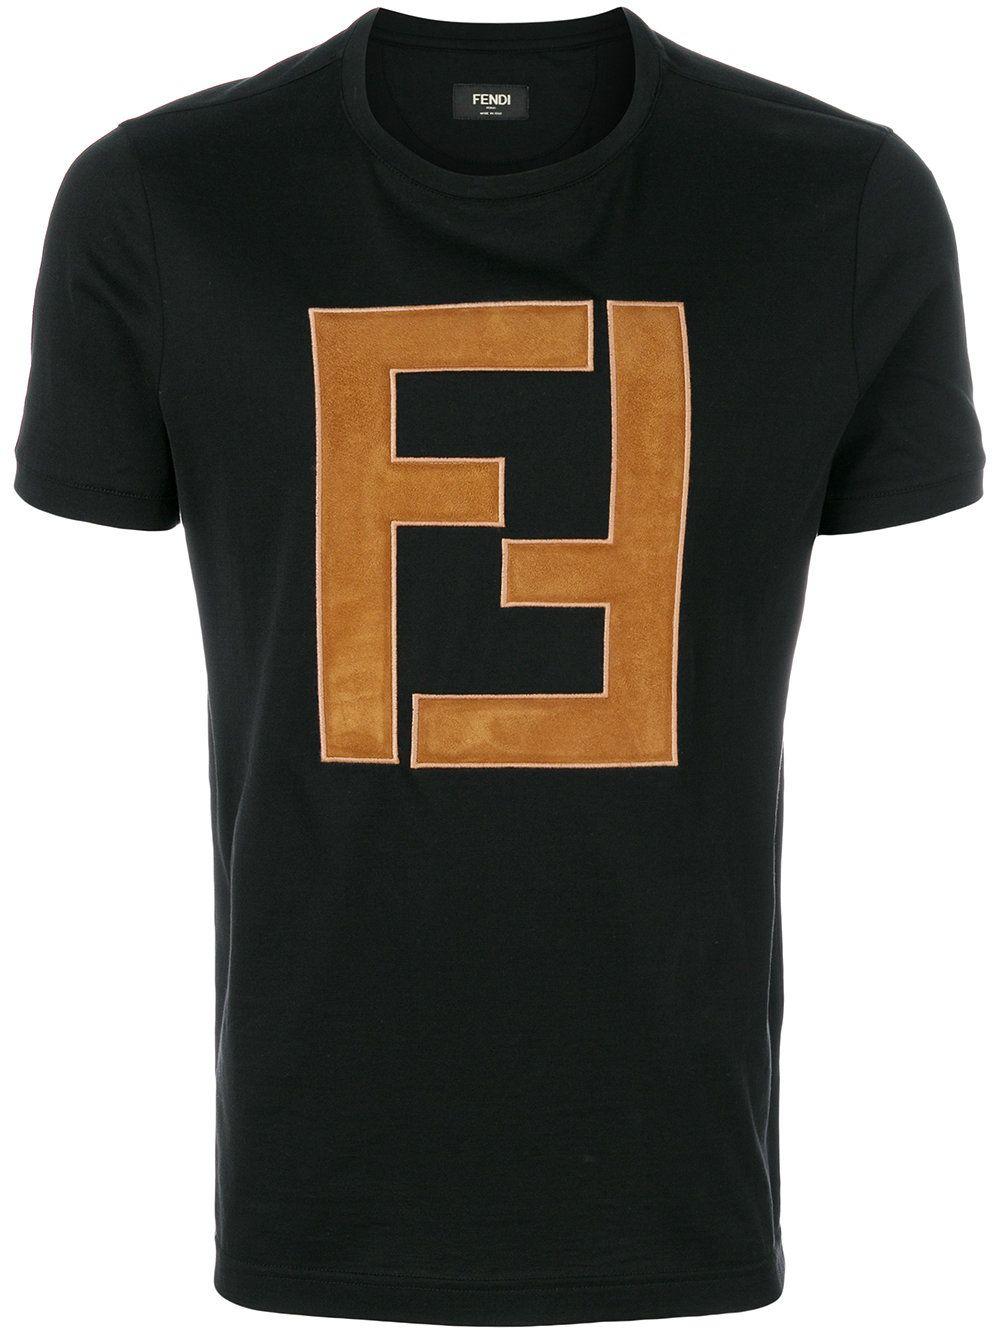 FENDI .  fendi  cloth     Fendi Men in 2019   Pinterest   Shirts, T ... 50474cce684